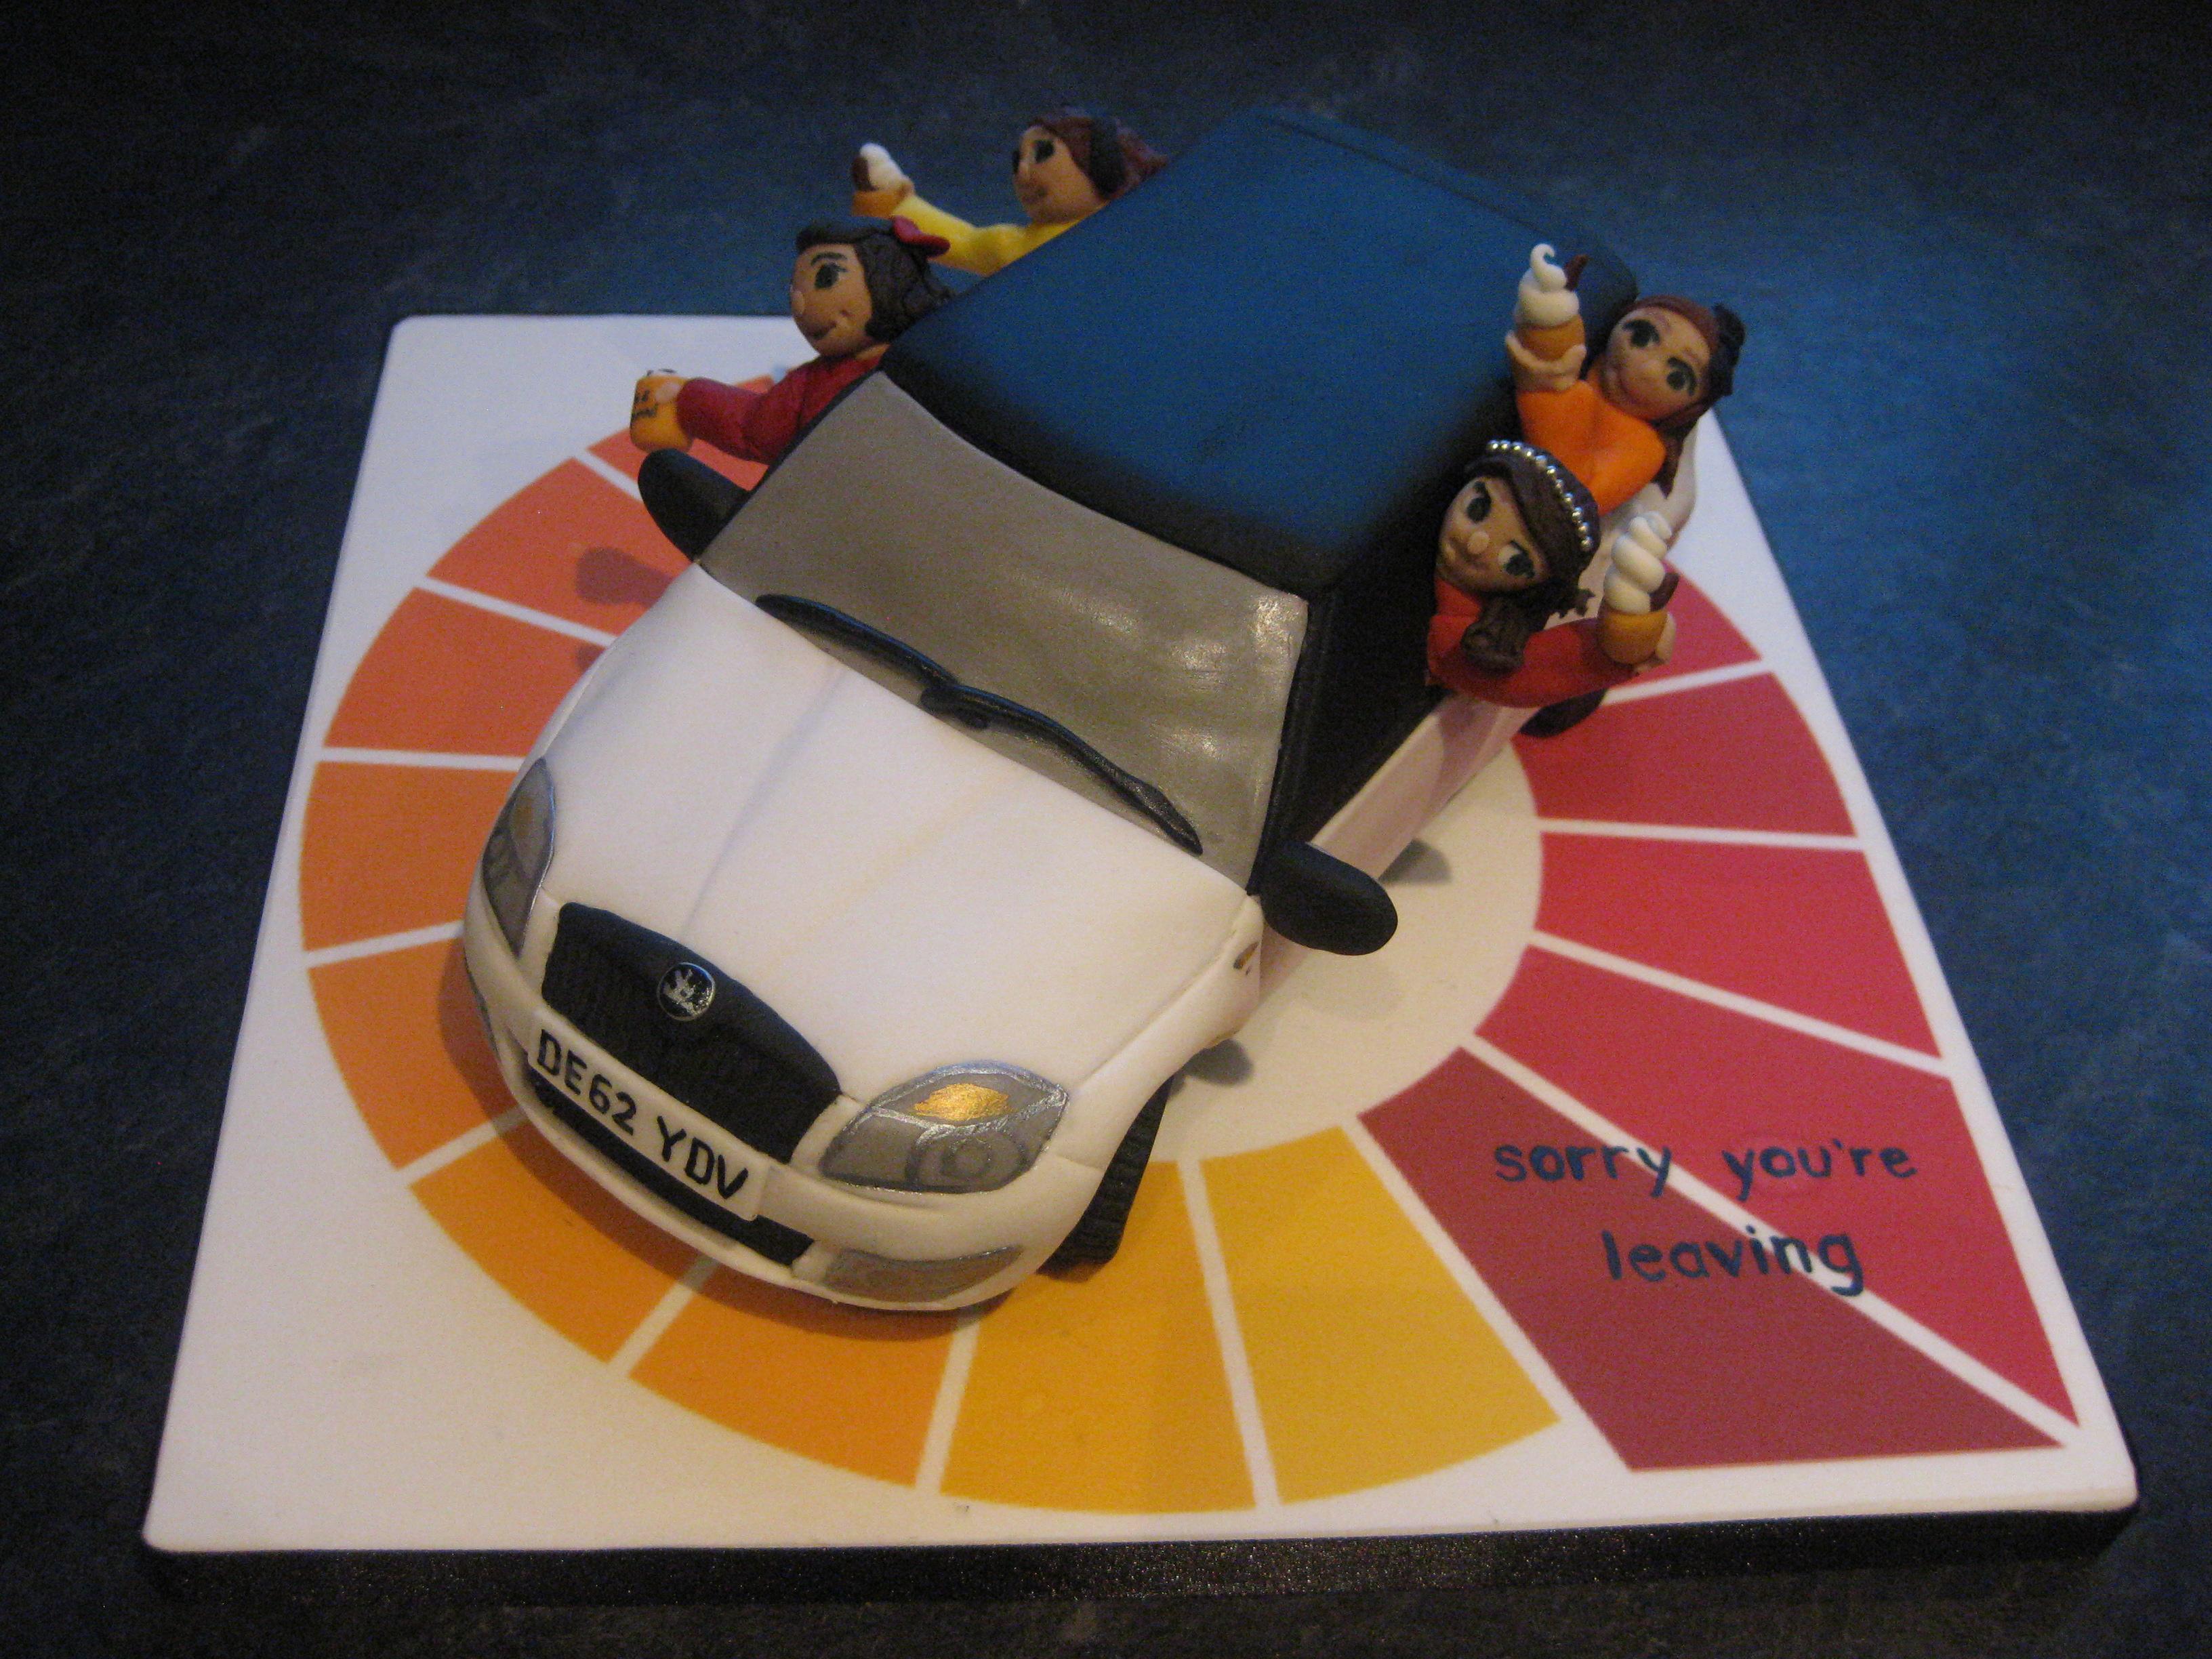 Skoda Fabia Girls miCake bespoke cakes for private corporate